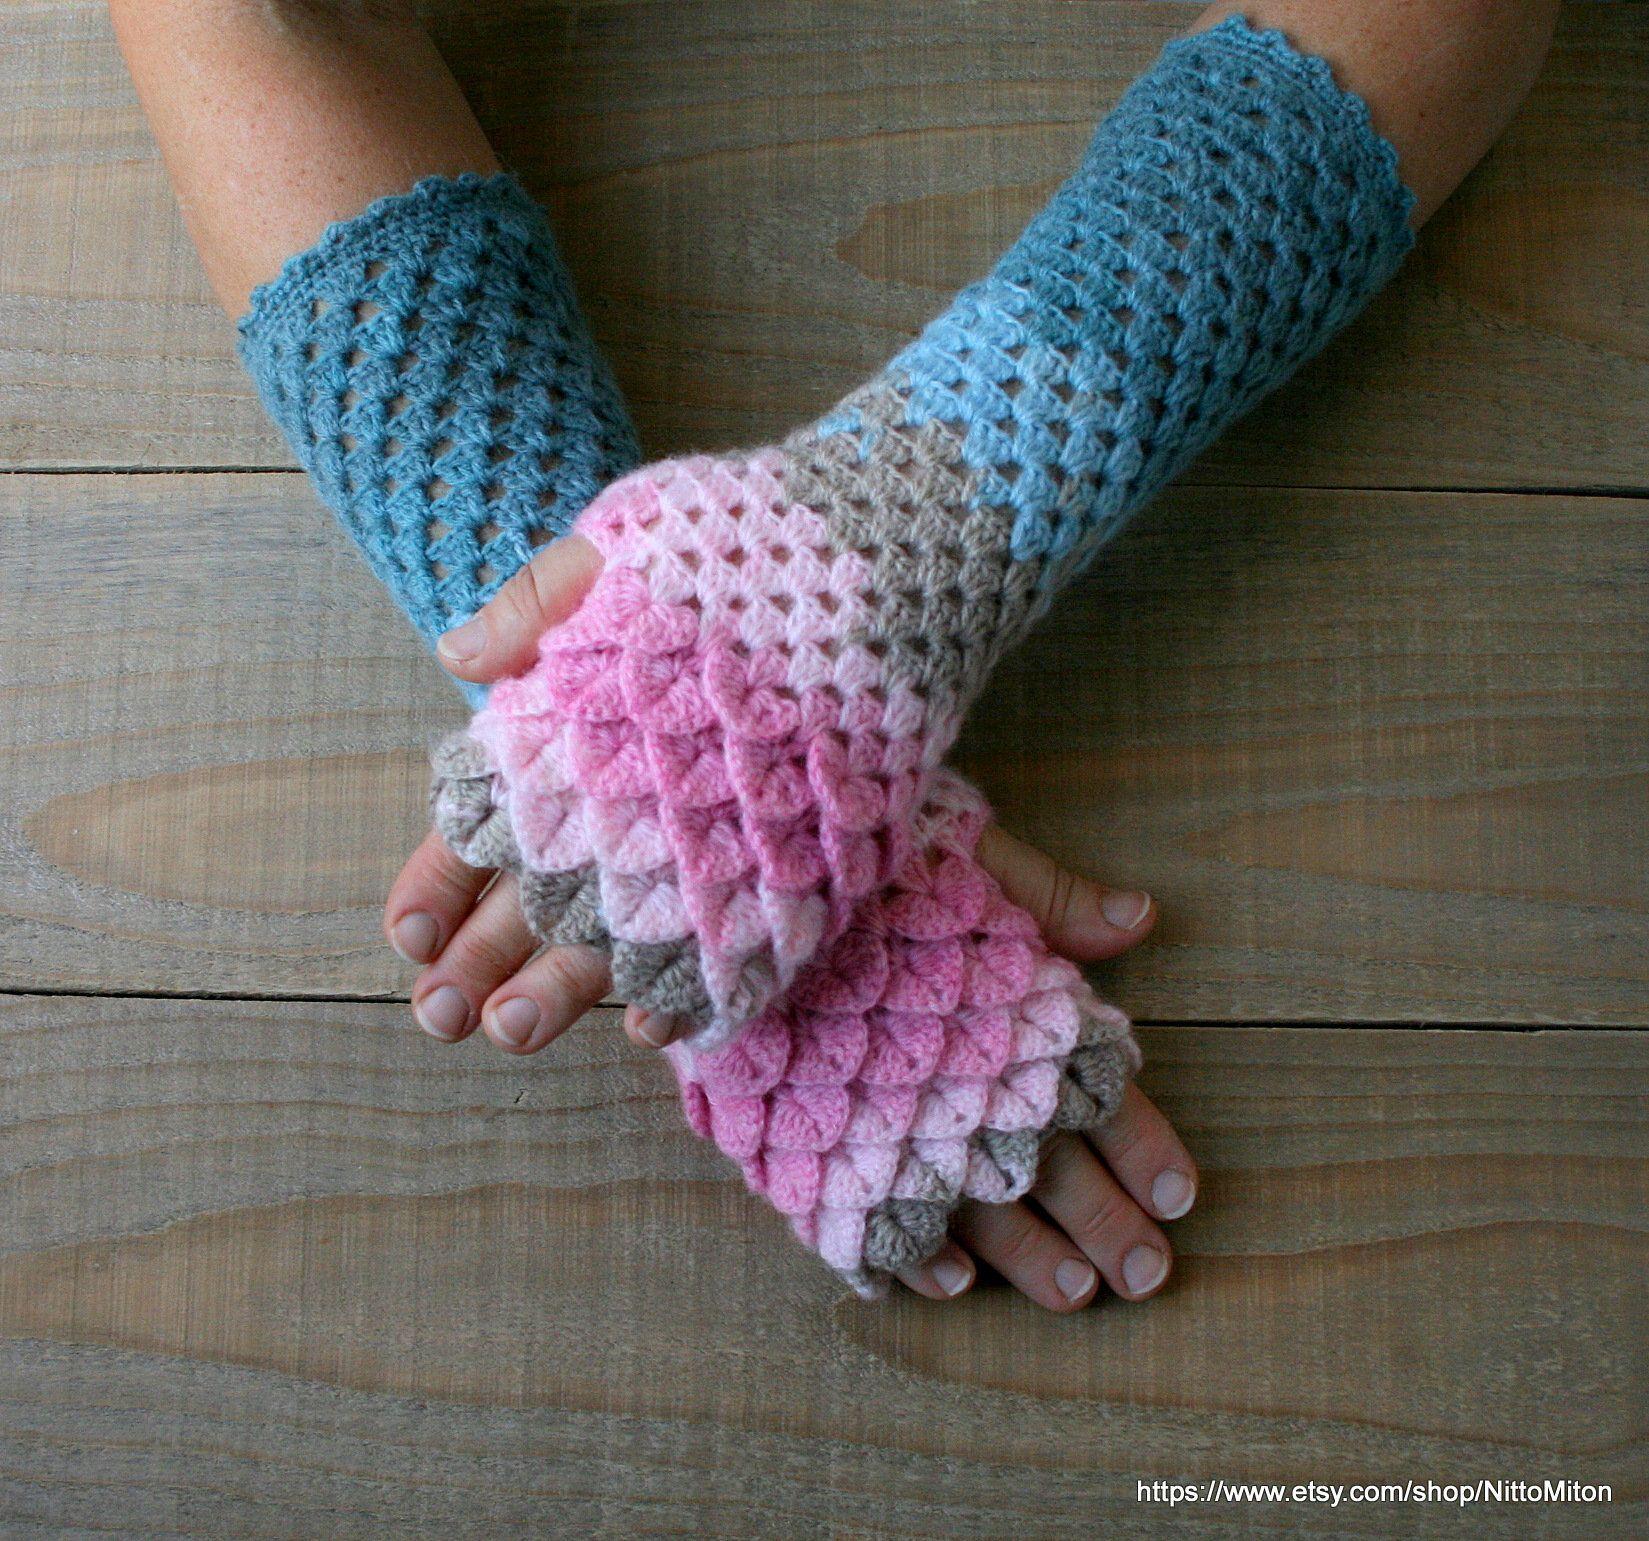 Fingerless Gloves Handmade Wrist Warmers Arm Warmers Mitts Ladies fingerless gloves lacy long mittens womens fingerless Dragons gloves